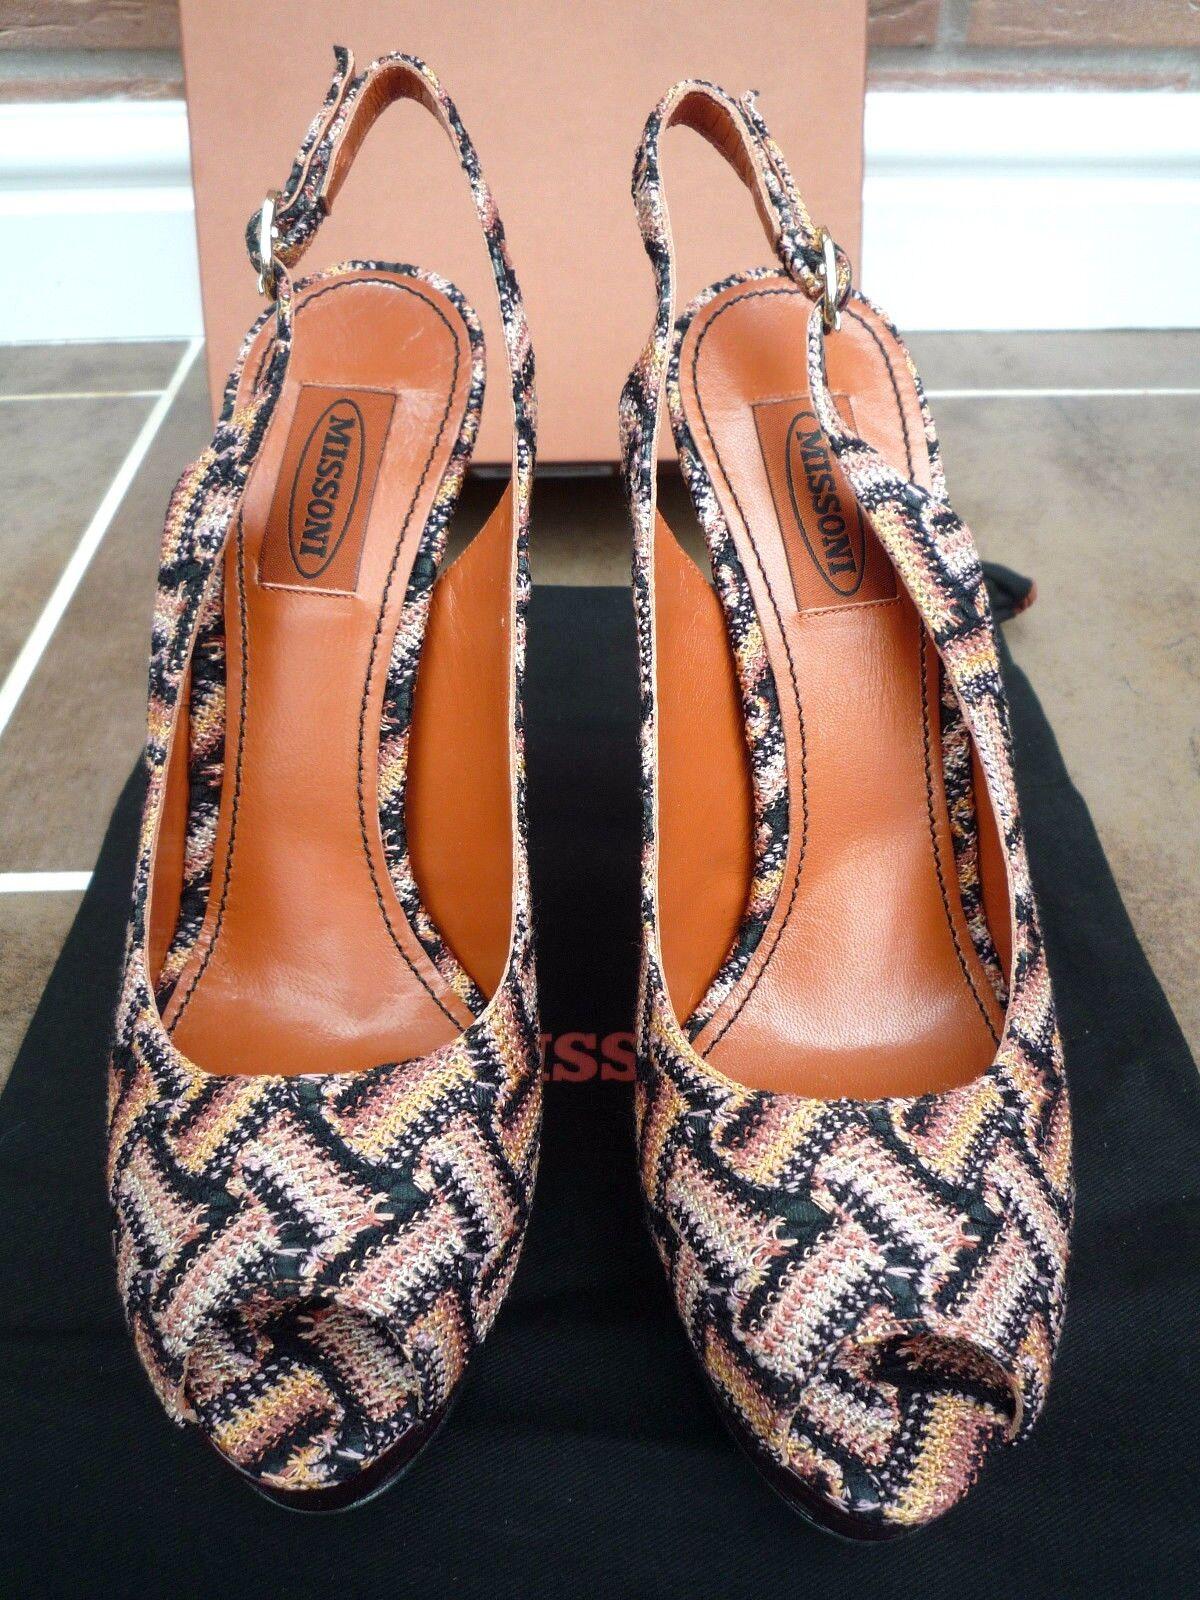 MISSONI MISSONI MISSONI RASHEL CESTINO PEEP TOE STILETTO Schuhe RETAIL  SIZE 5 MADE IN ITALY aea2bc